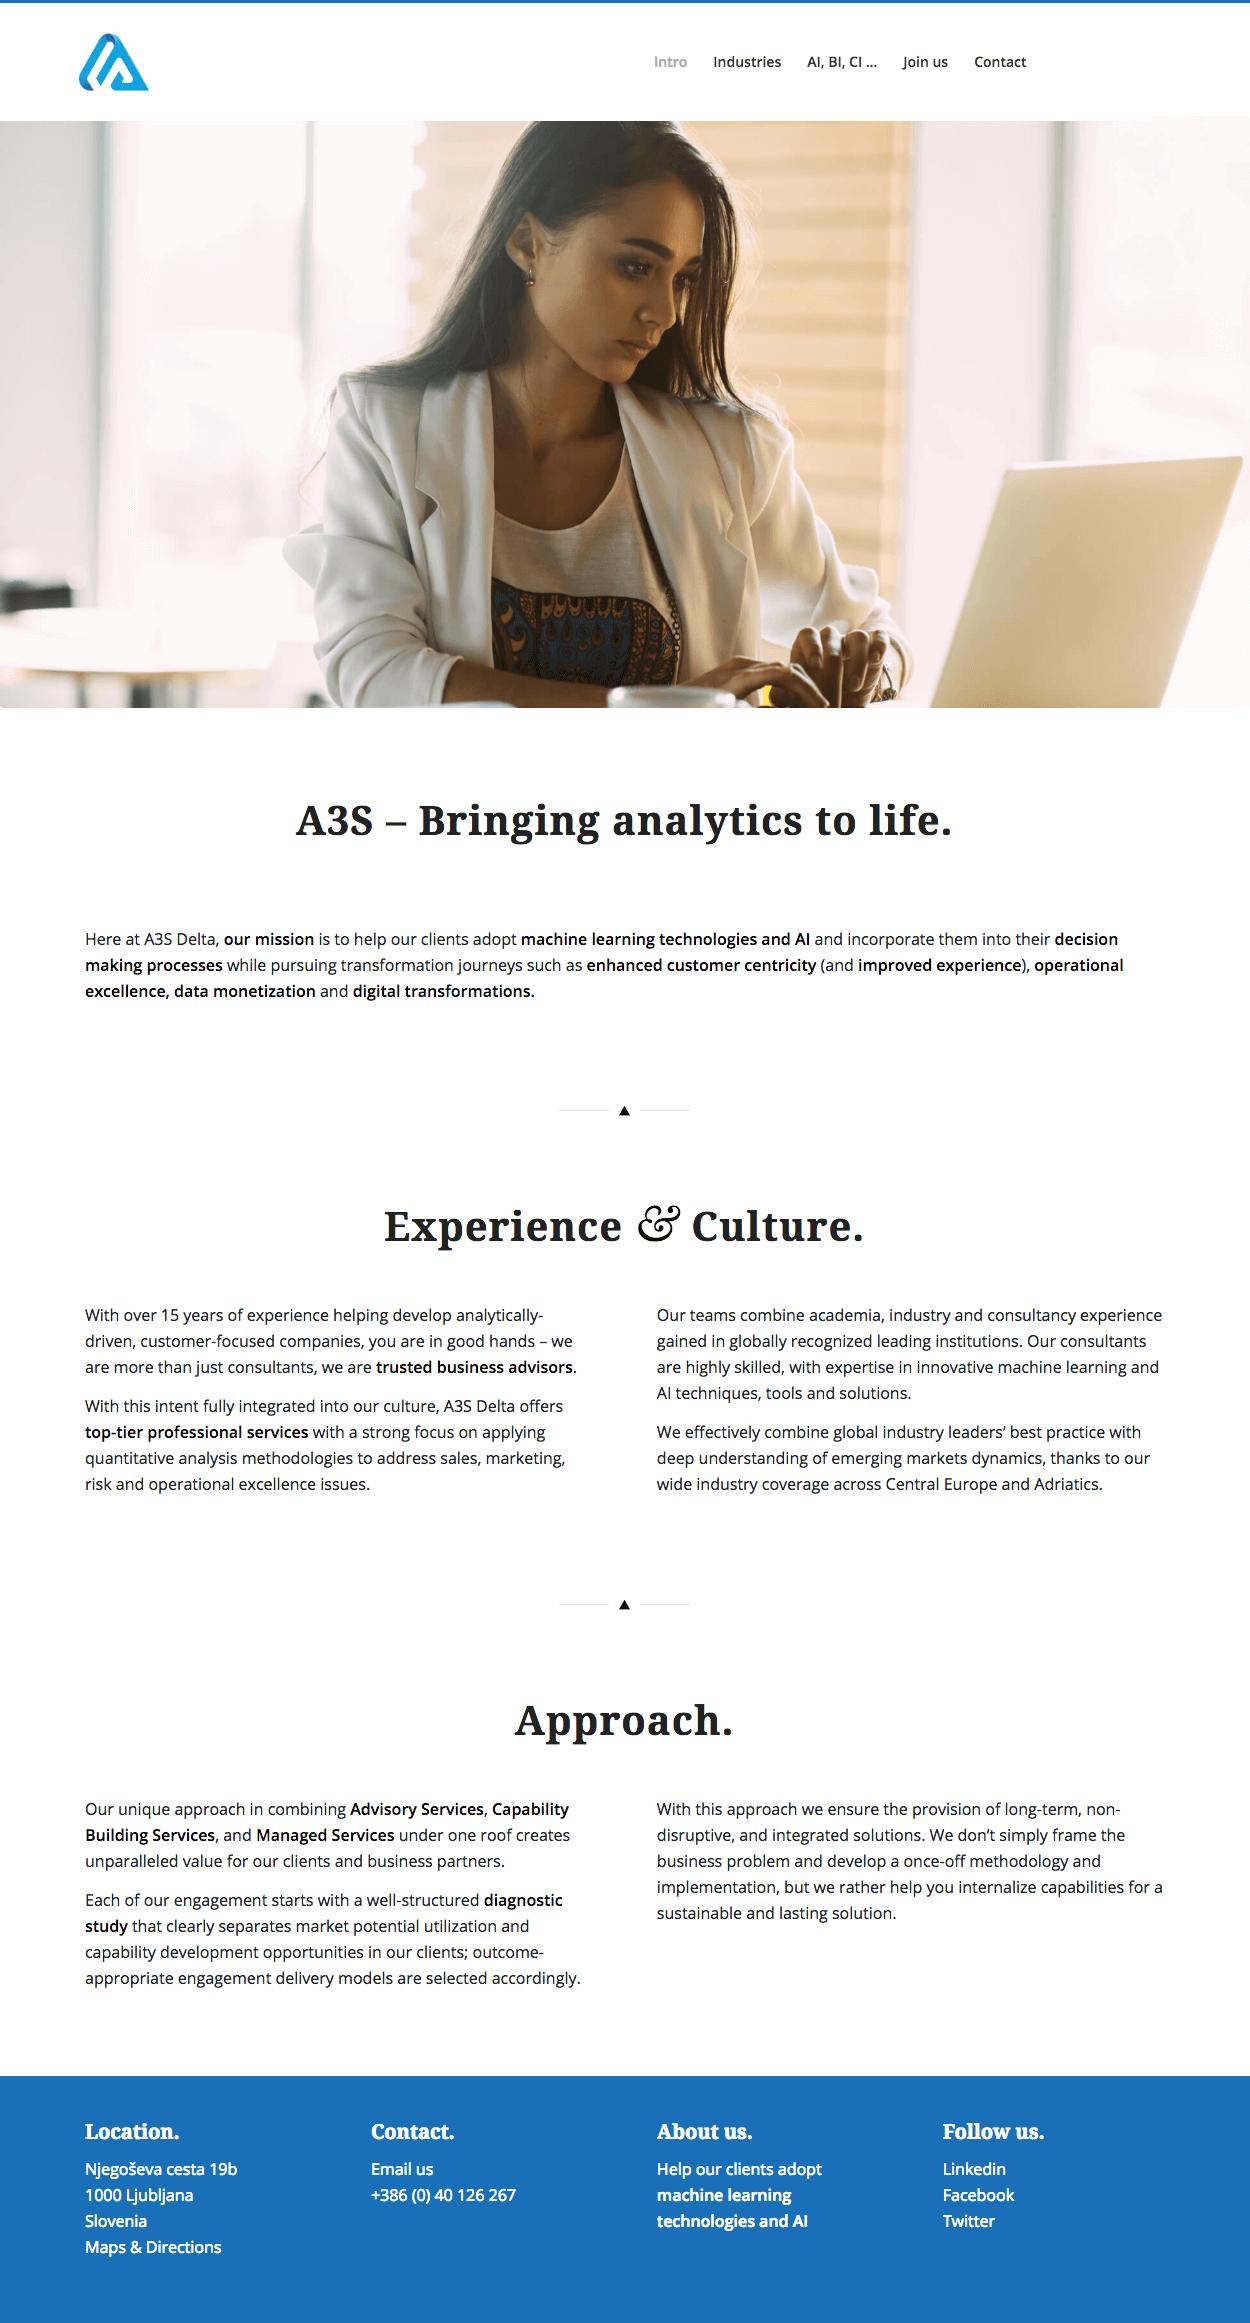 A3S - Home